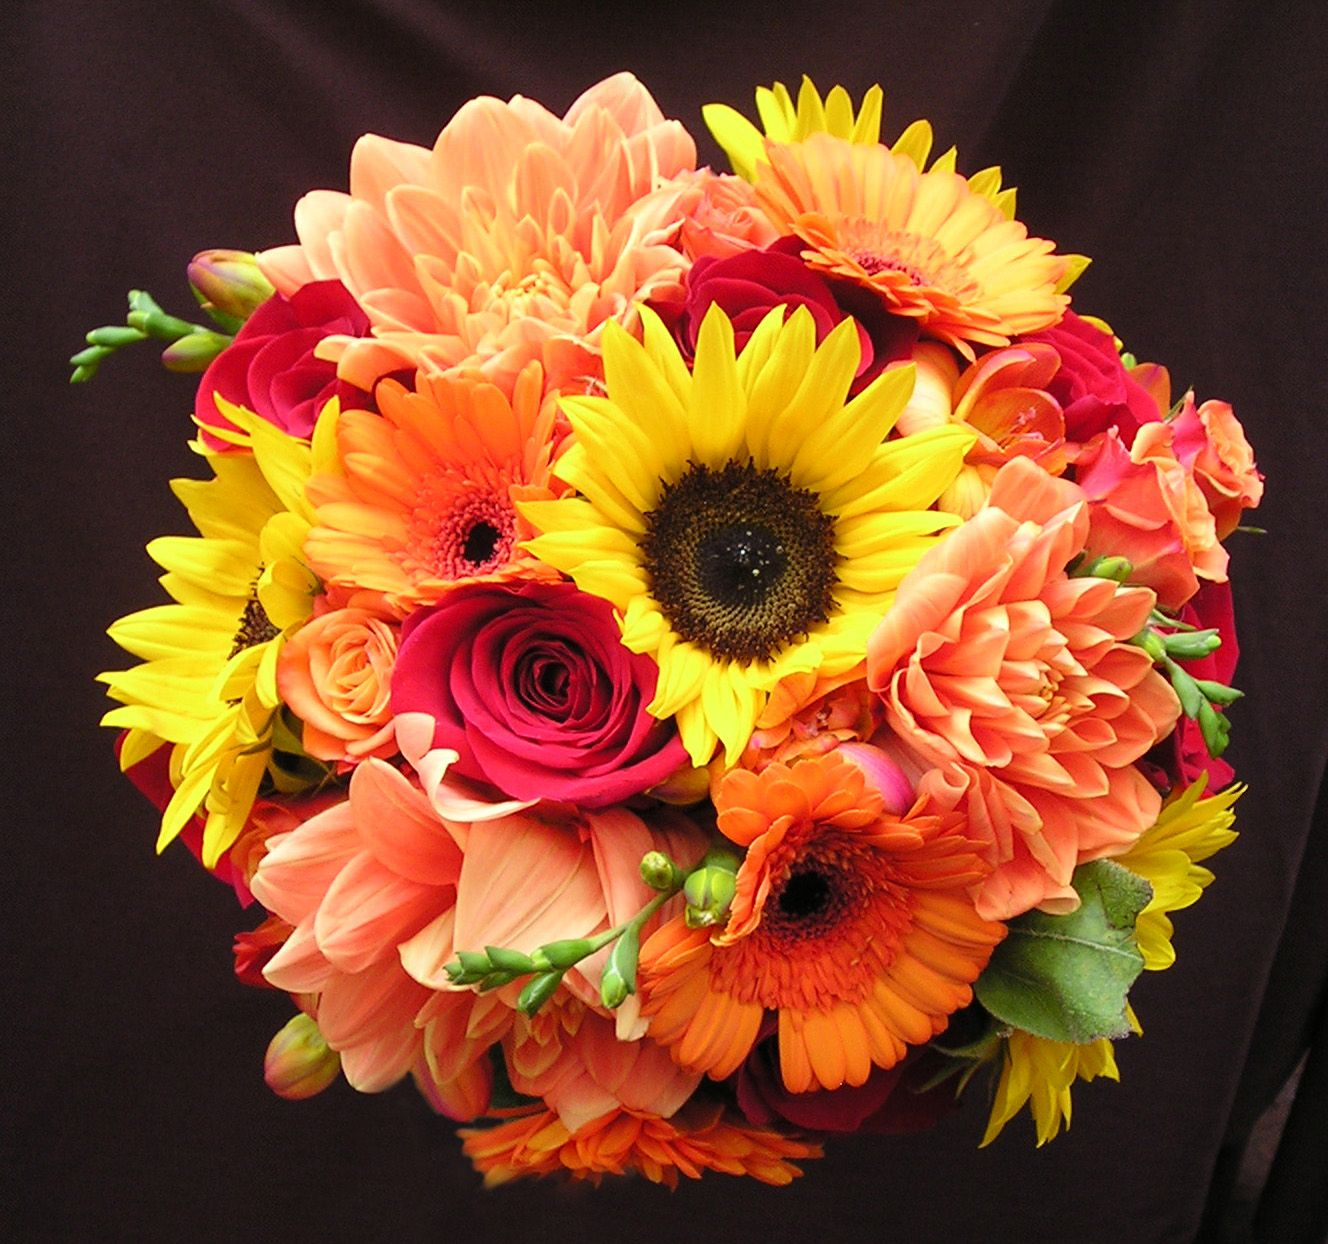 Hand Tied Bouquet Of Sunflowers Peach Dahlias Orange